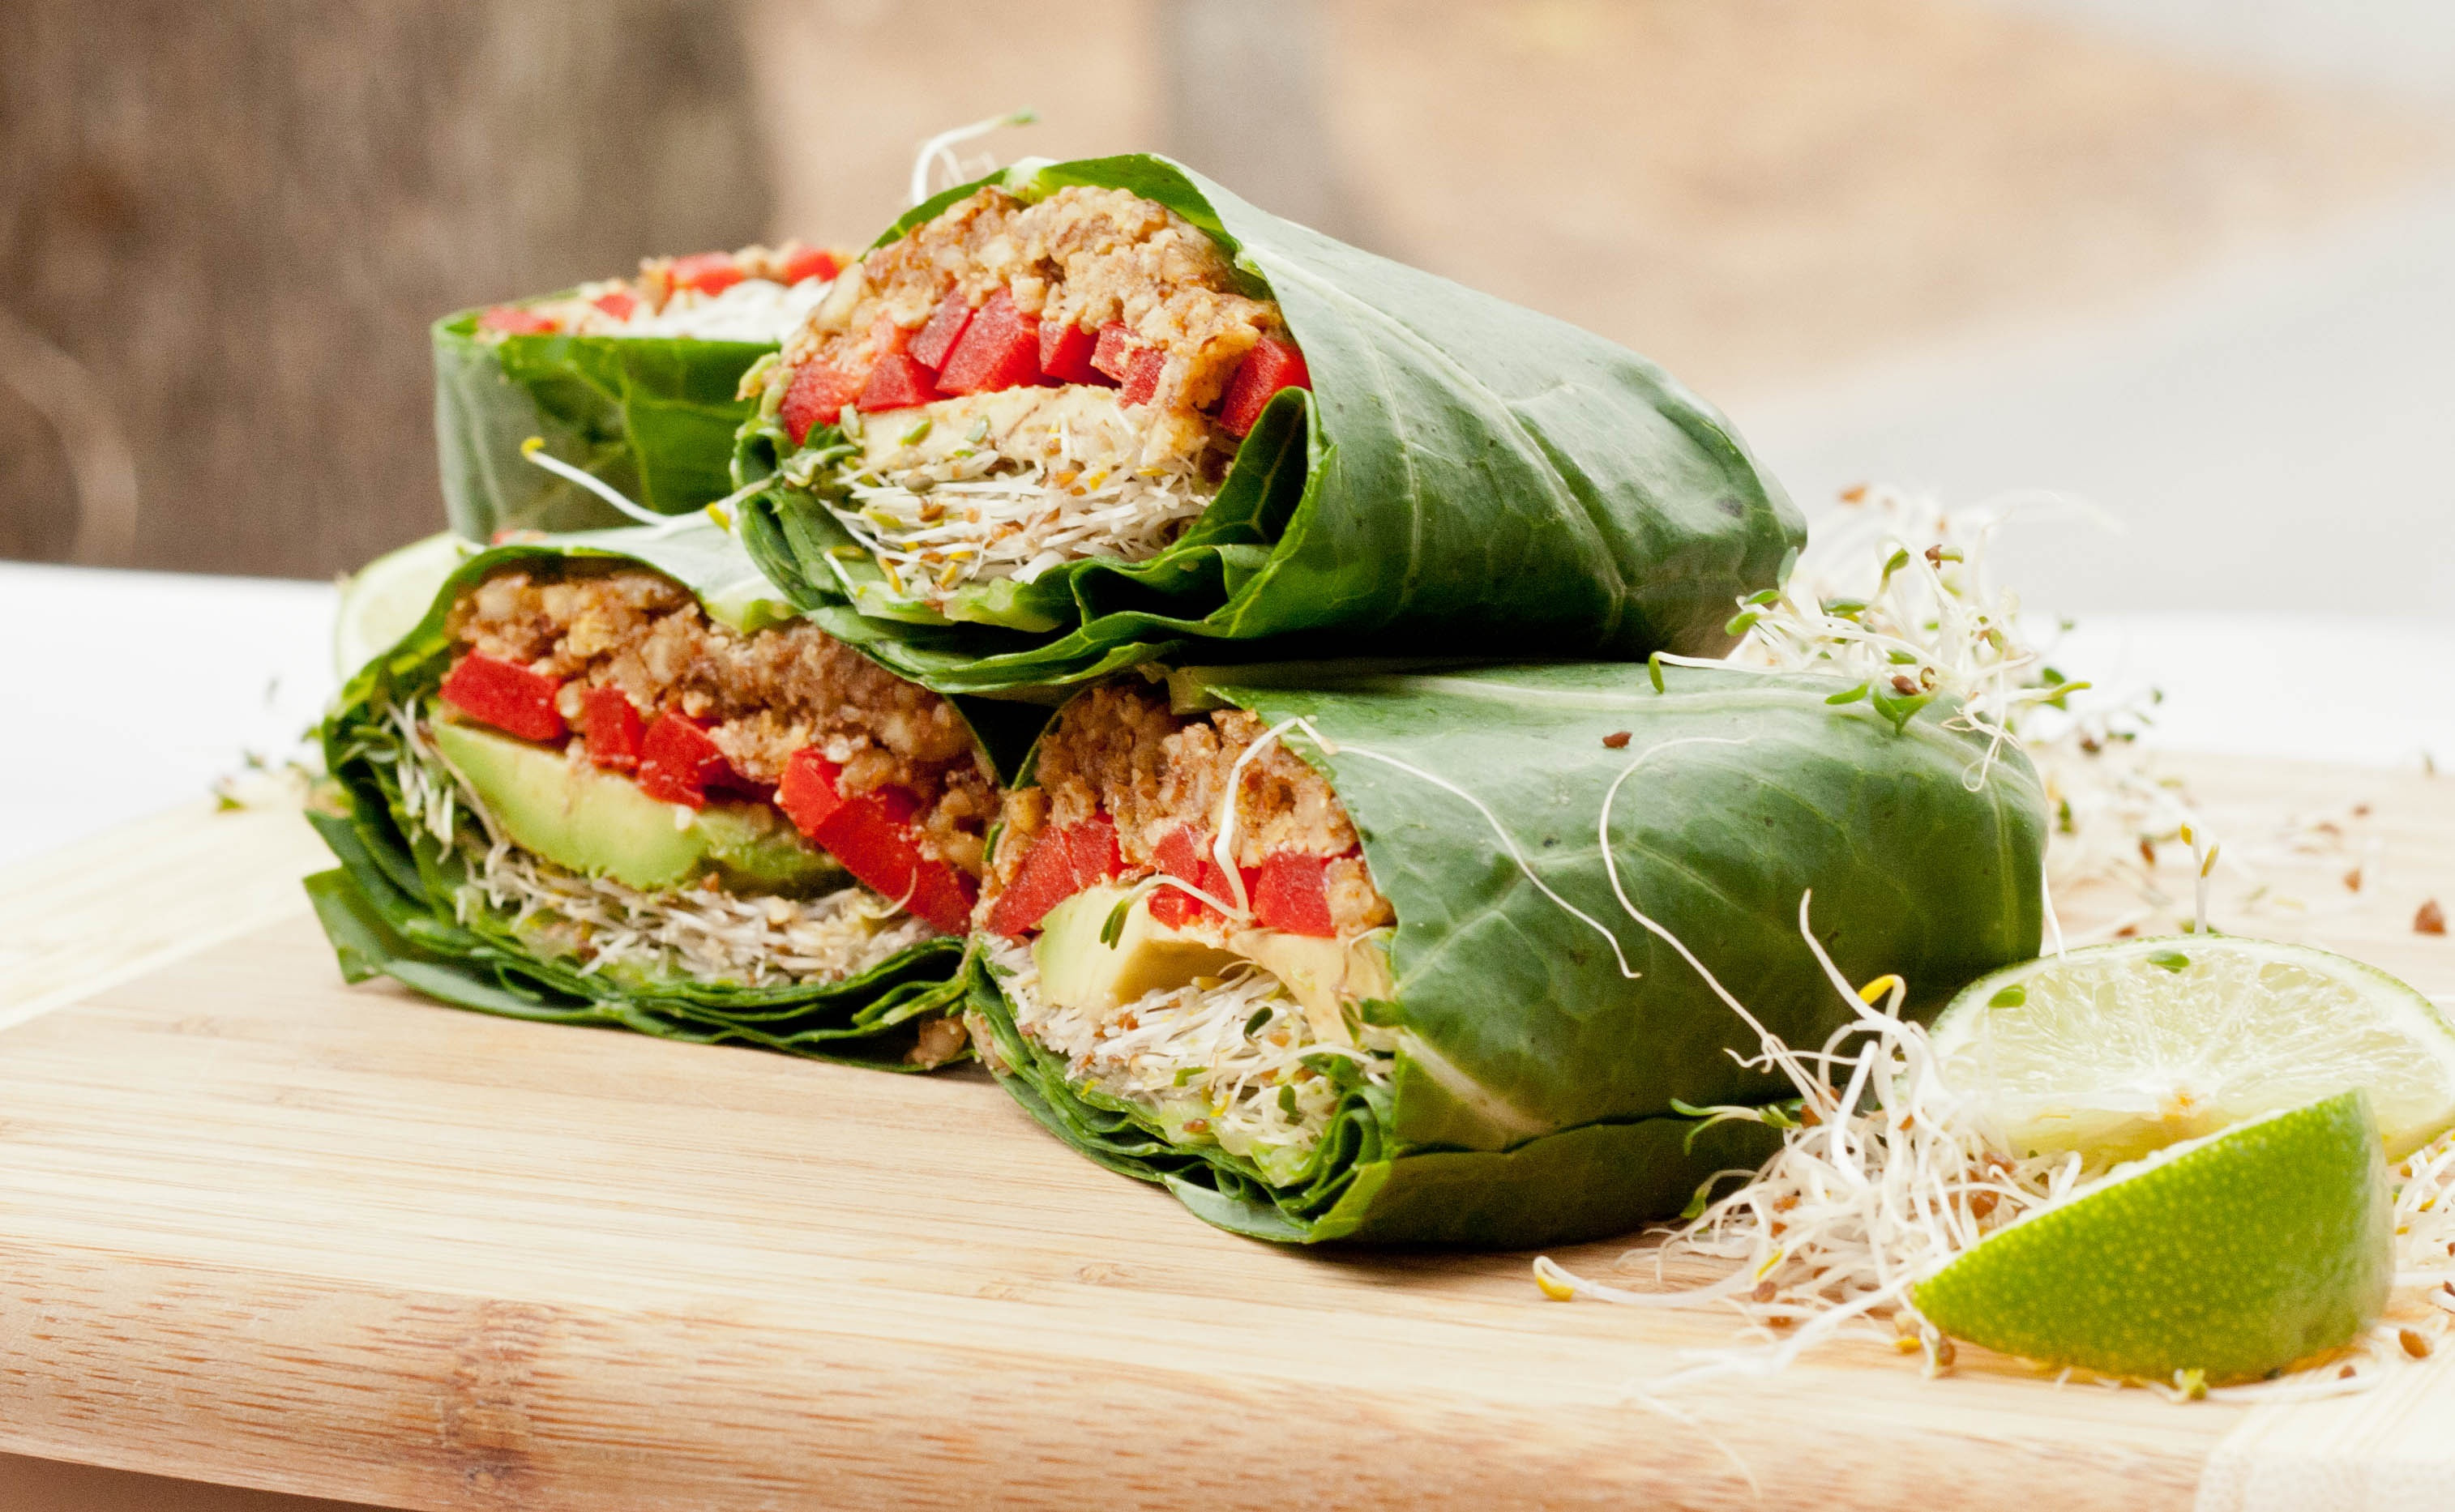 Healthy Raw Vegan Recipes  The Best Raw Vegan Recipes Healthy Food Raw Diets